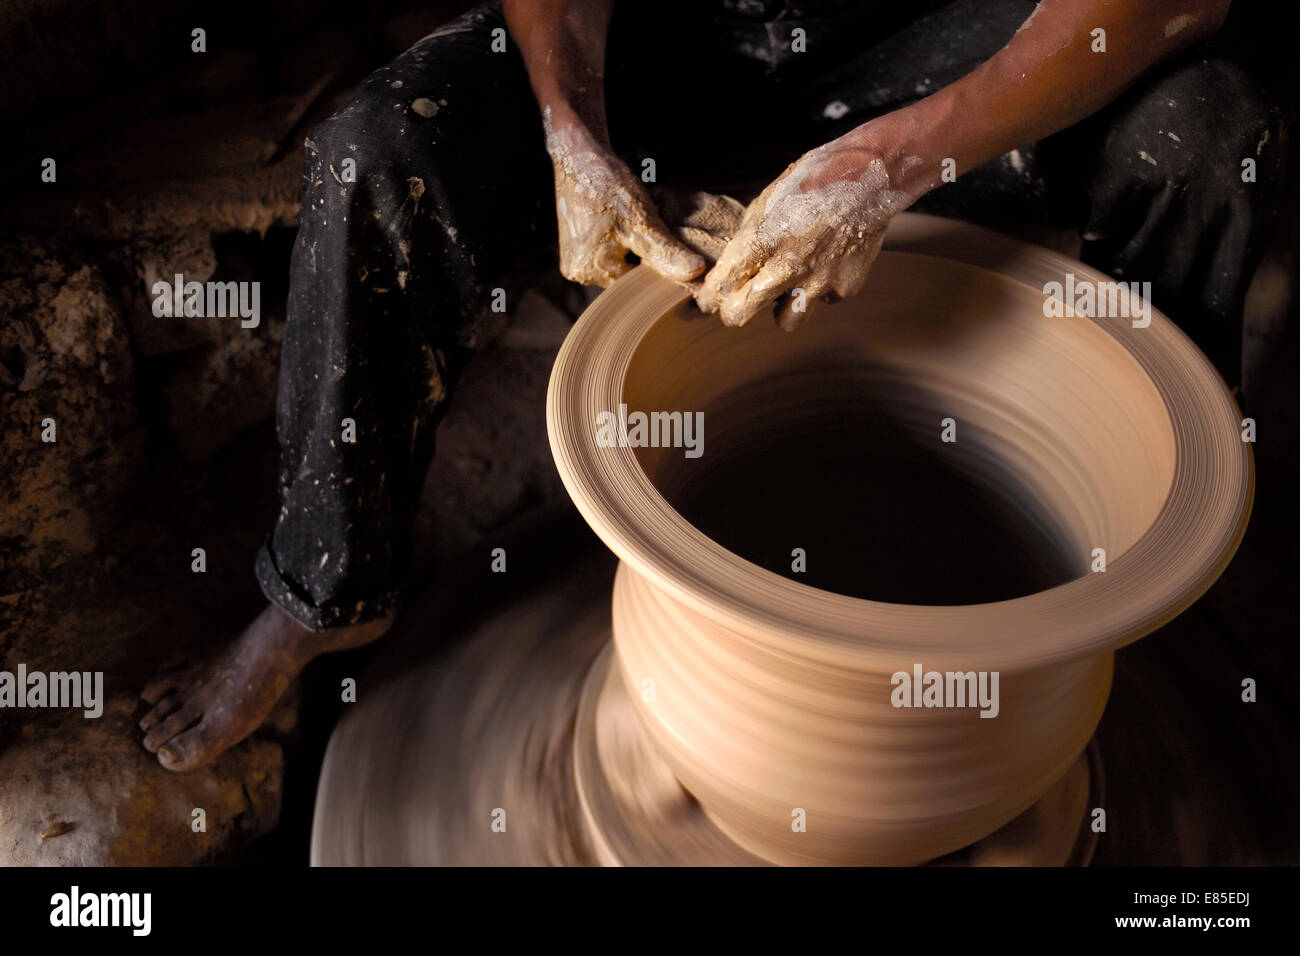 Handmade pottery - Stock Image